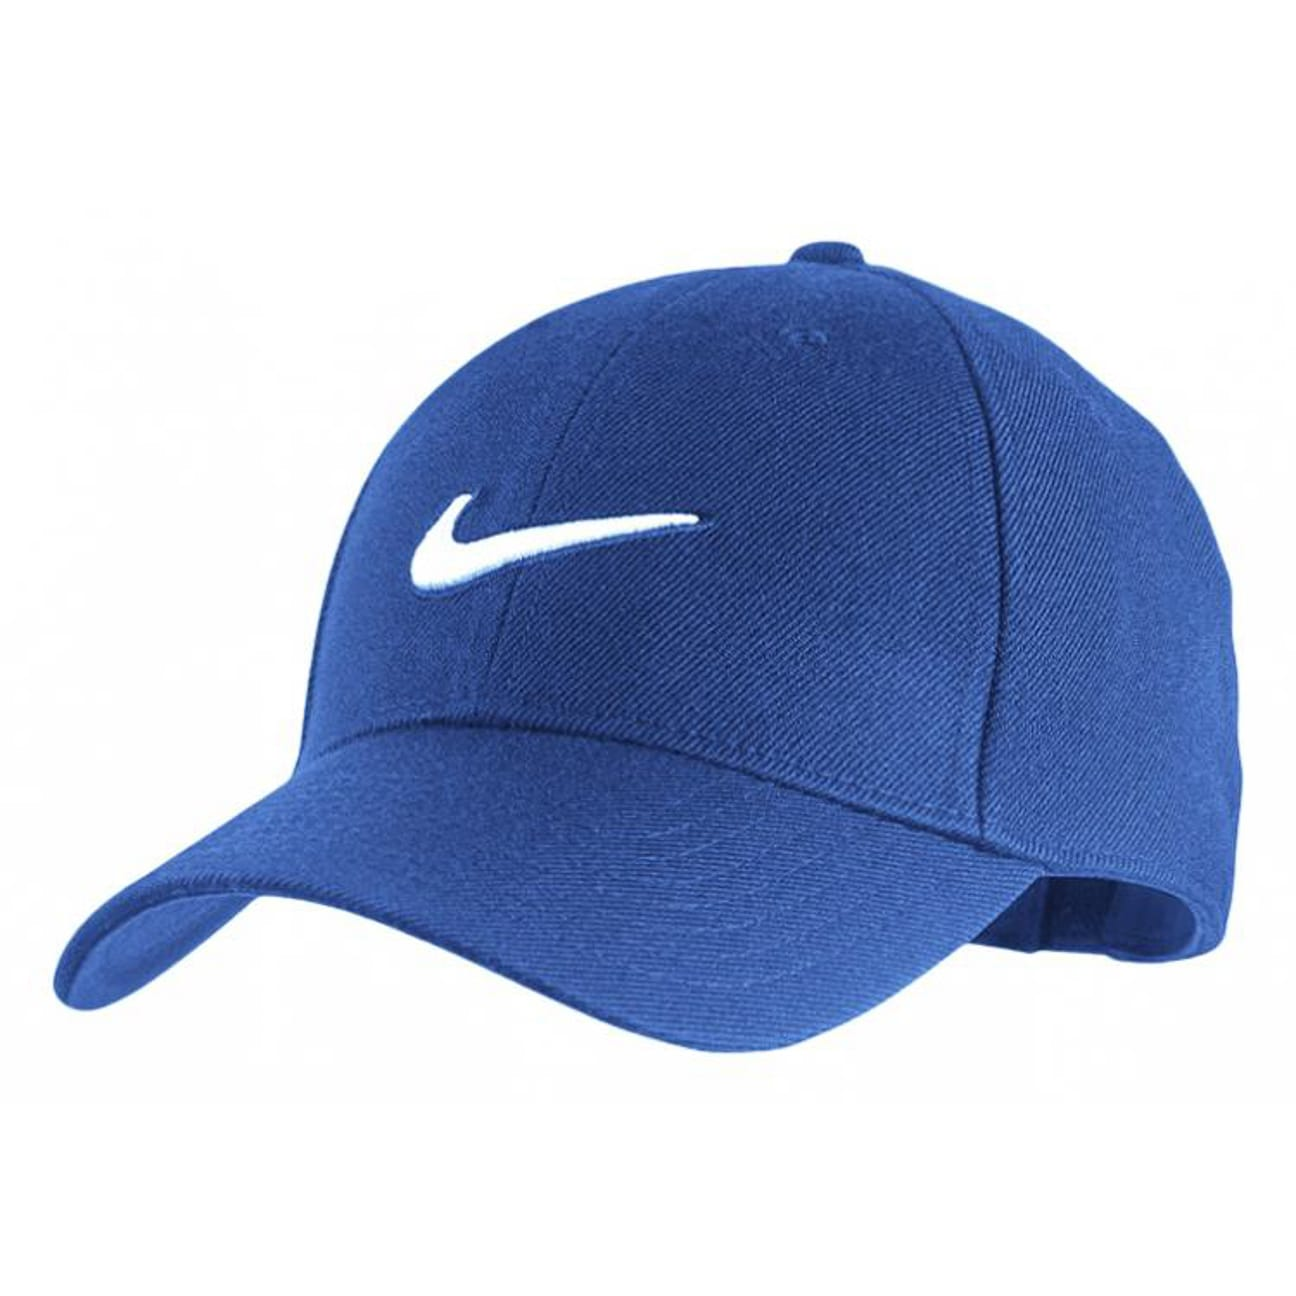 19d300845e795 ... Structured Swoosh Cap by Nike - blue 1 ...